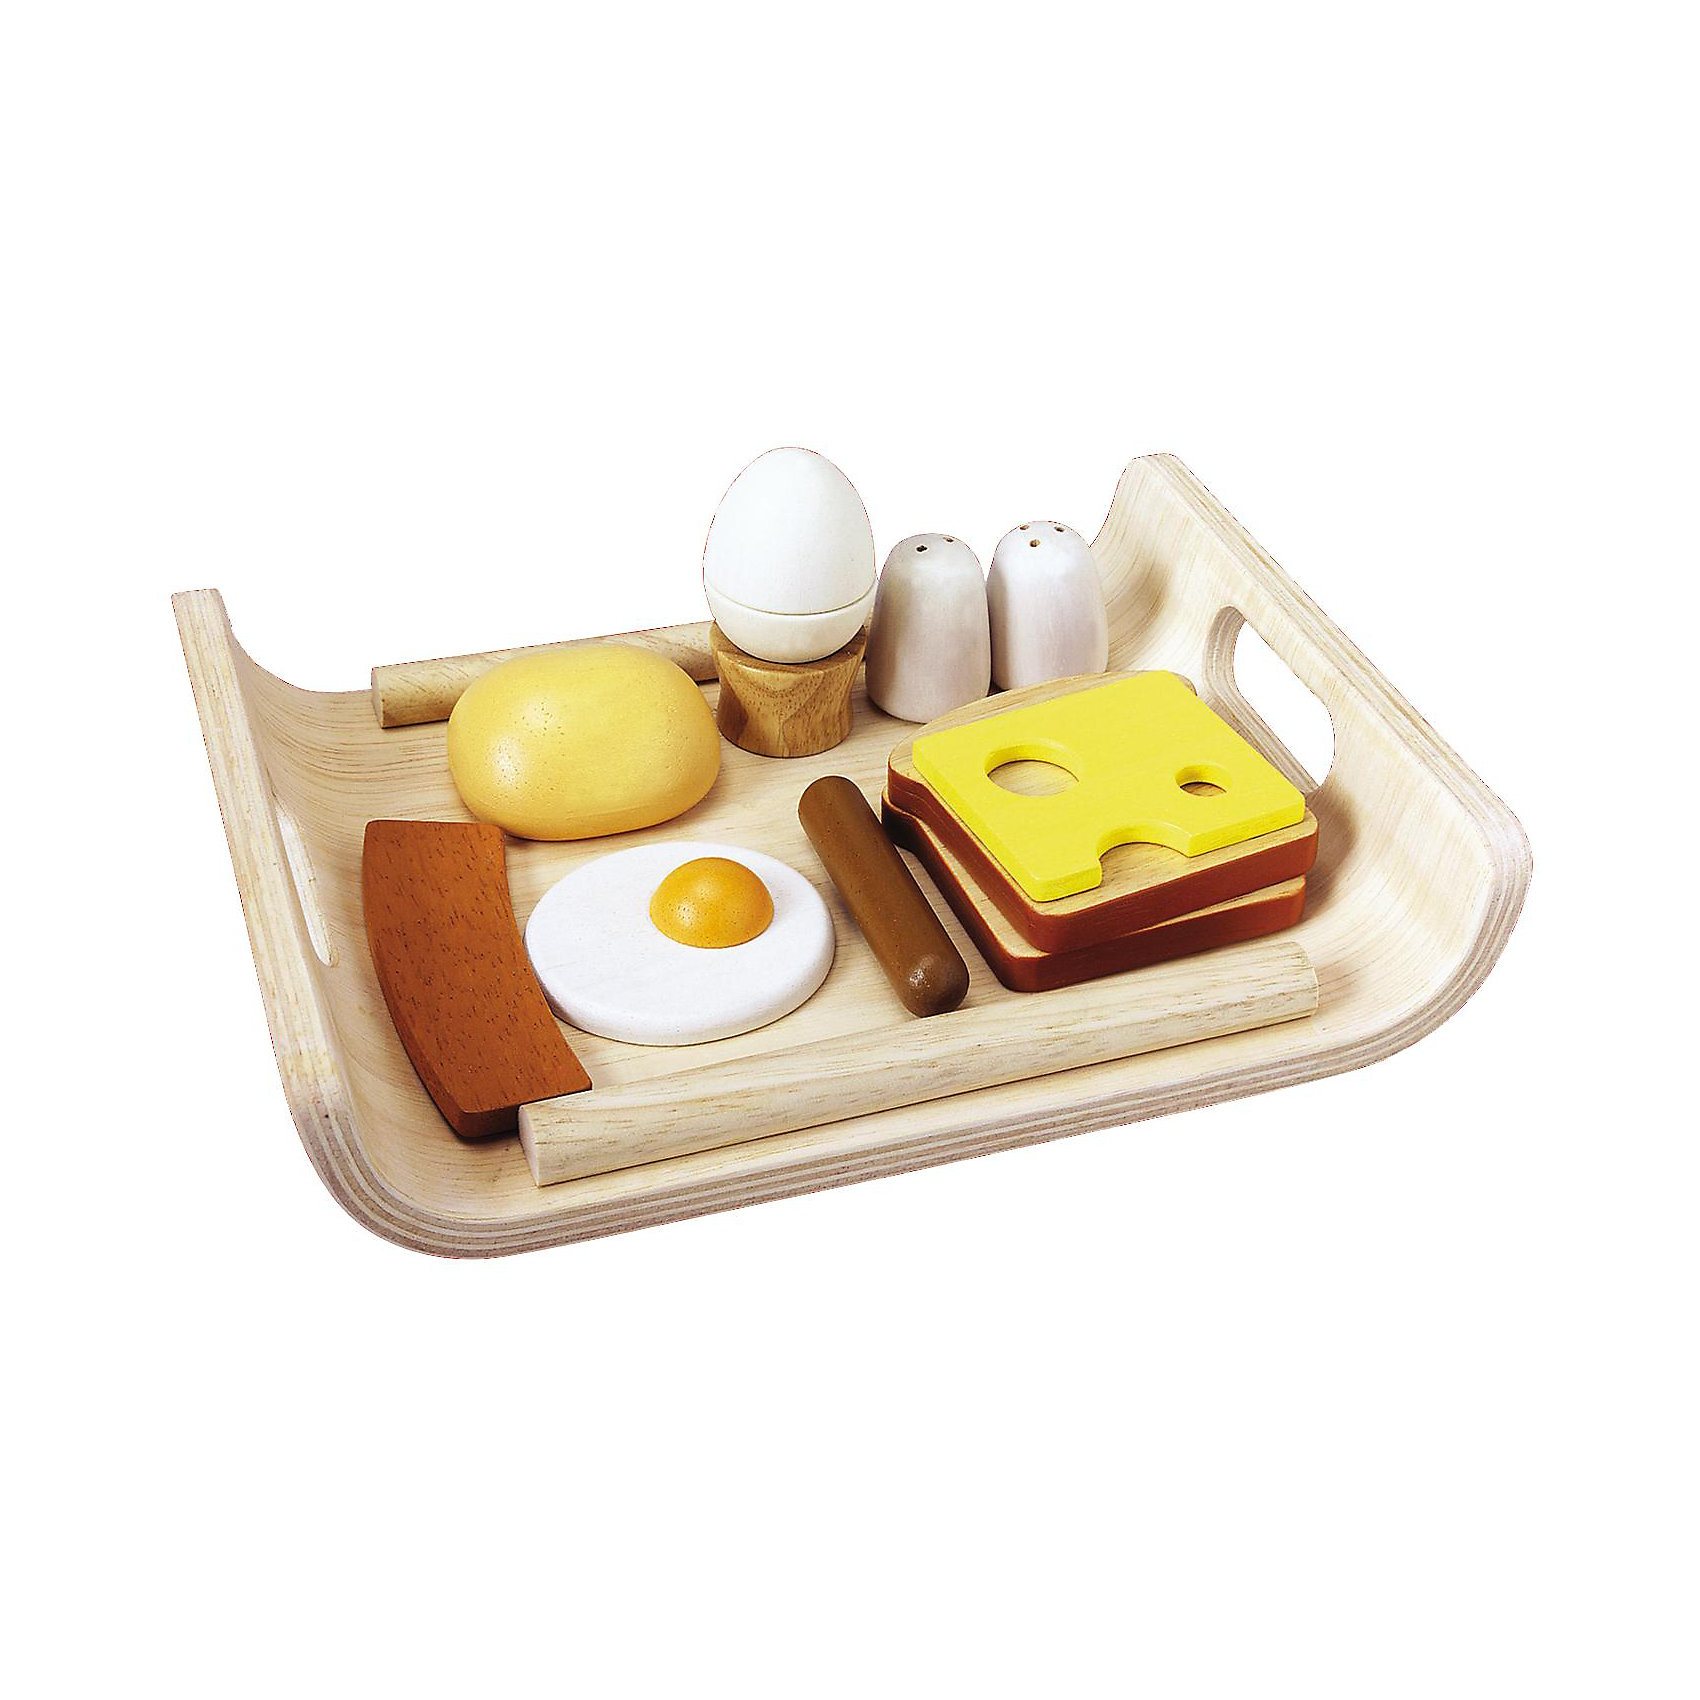 Plan Toys PLAN TOYS 3415 Набор Завтрак на подносе звезда самолет томагавк 7201з